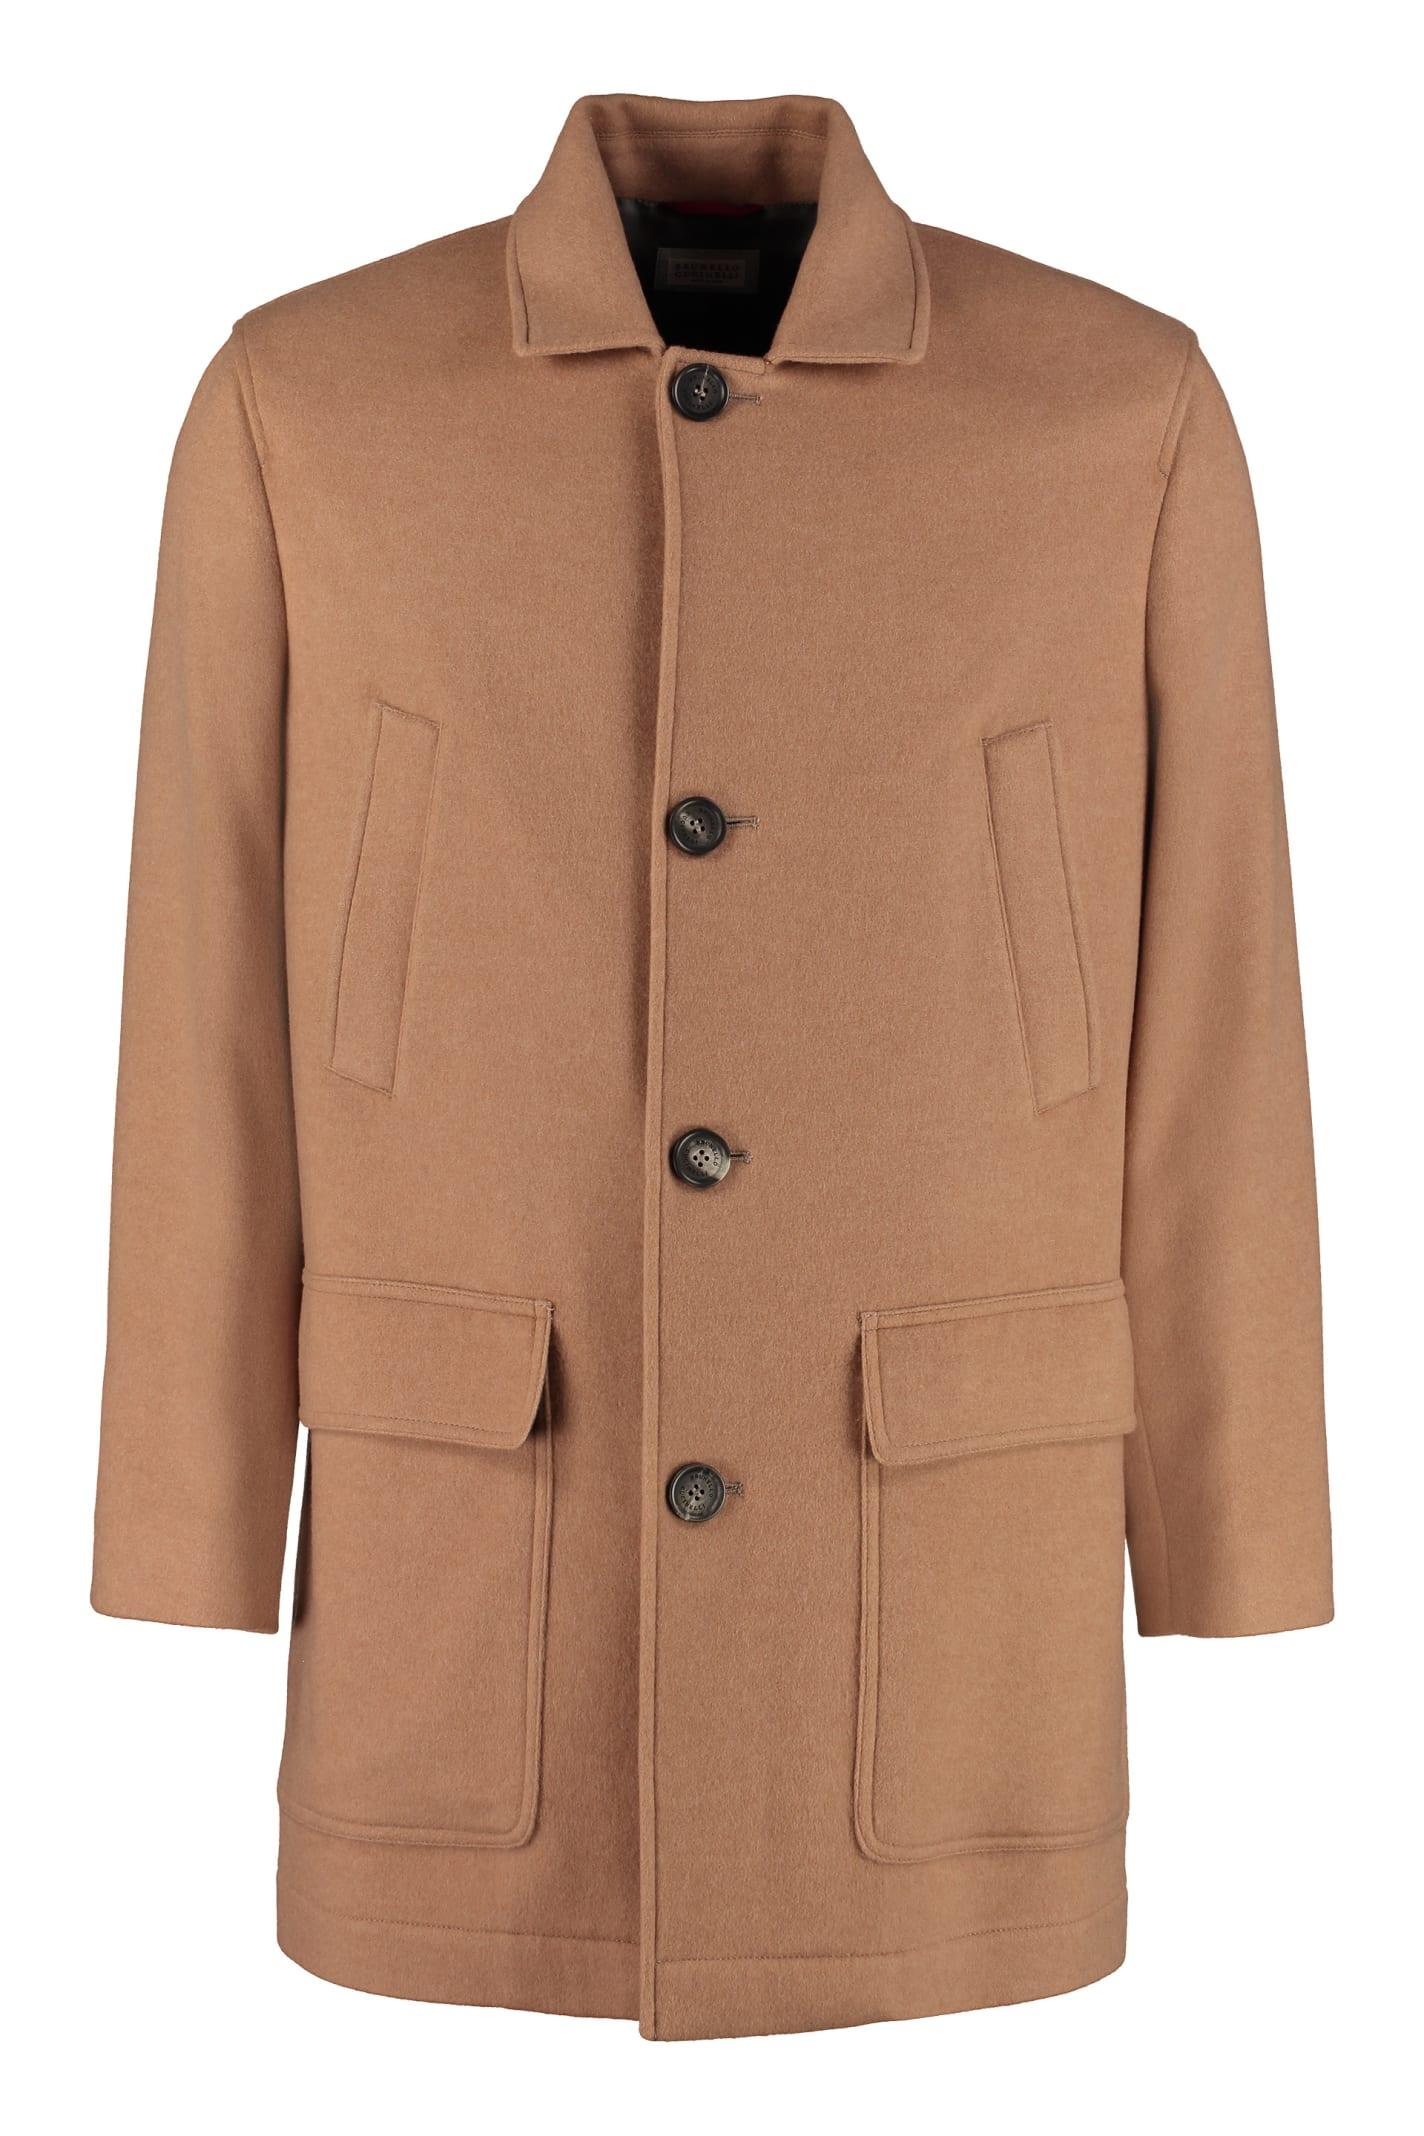 finest selection f09ac c46a9 Best price on the market at italist | Brunello Cucinelli Brunello Cucinelli  Cashmere Coat